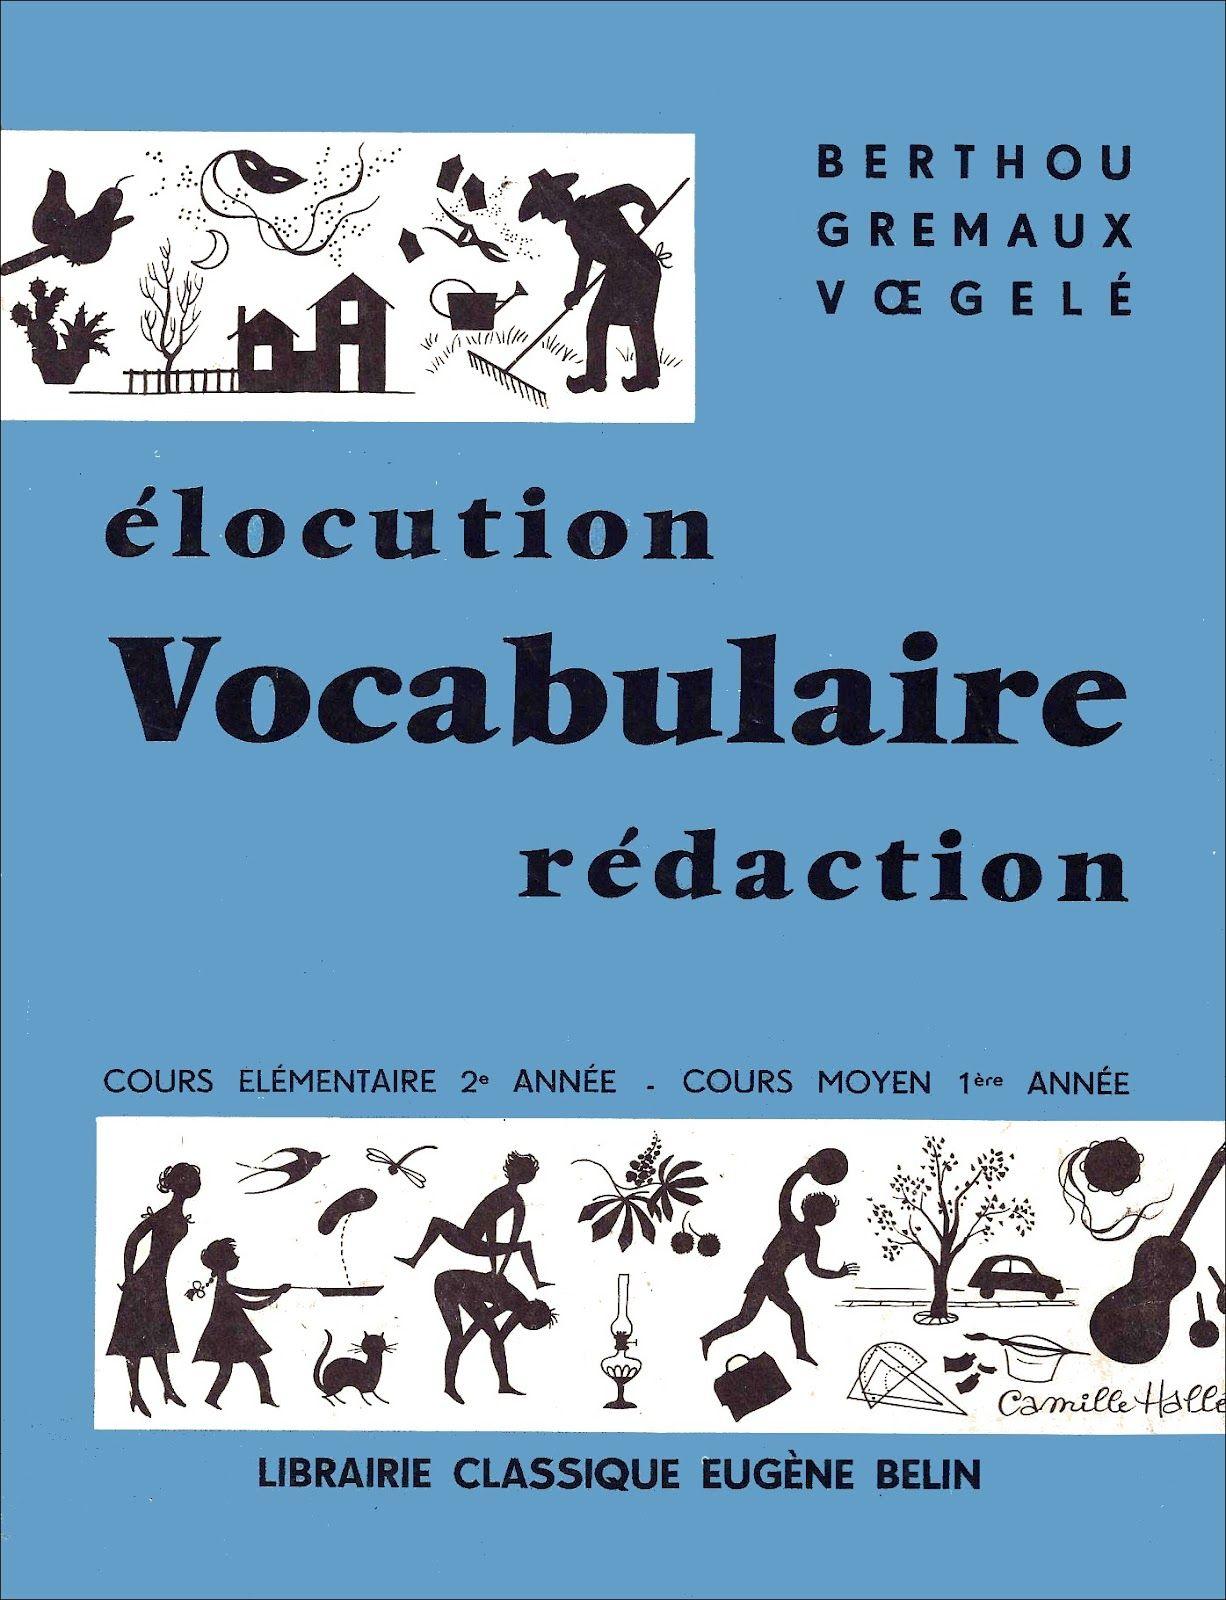 Berthou Elocution Vocabulaire Redaction Ce2 Cm1 Redaction